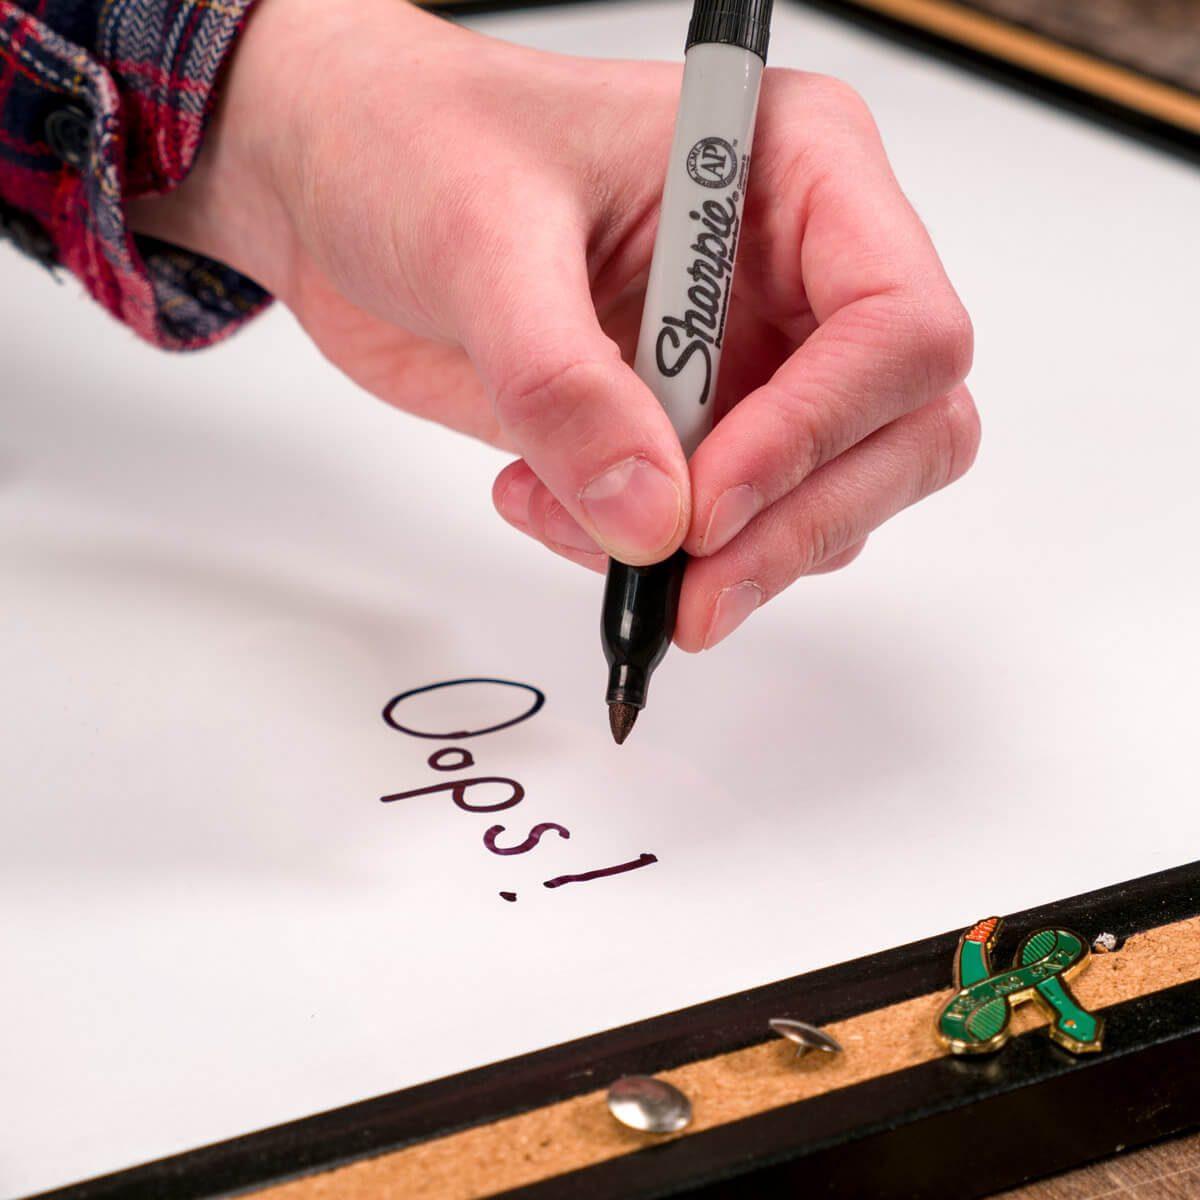 dry erase board permanent marker handy hints